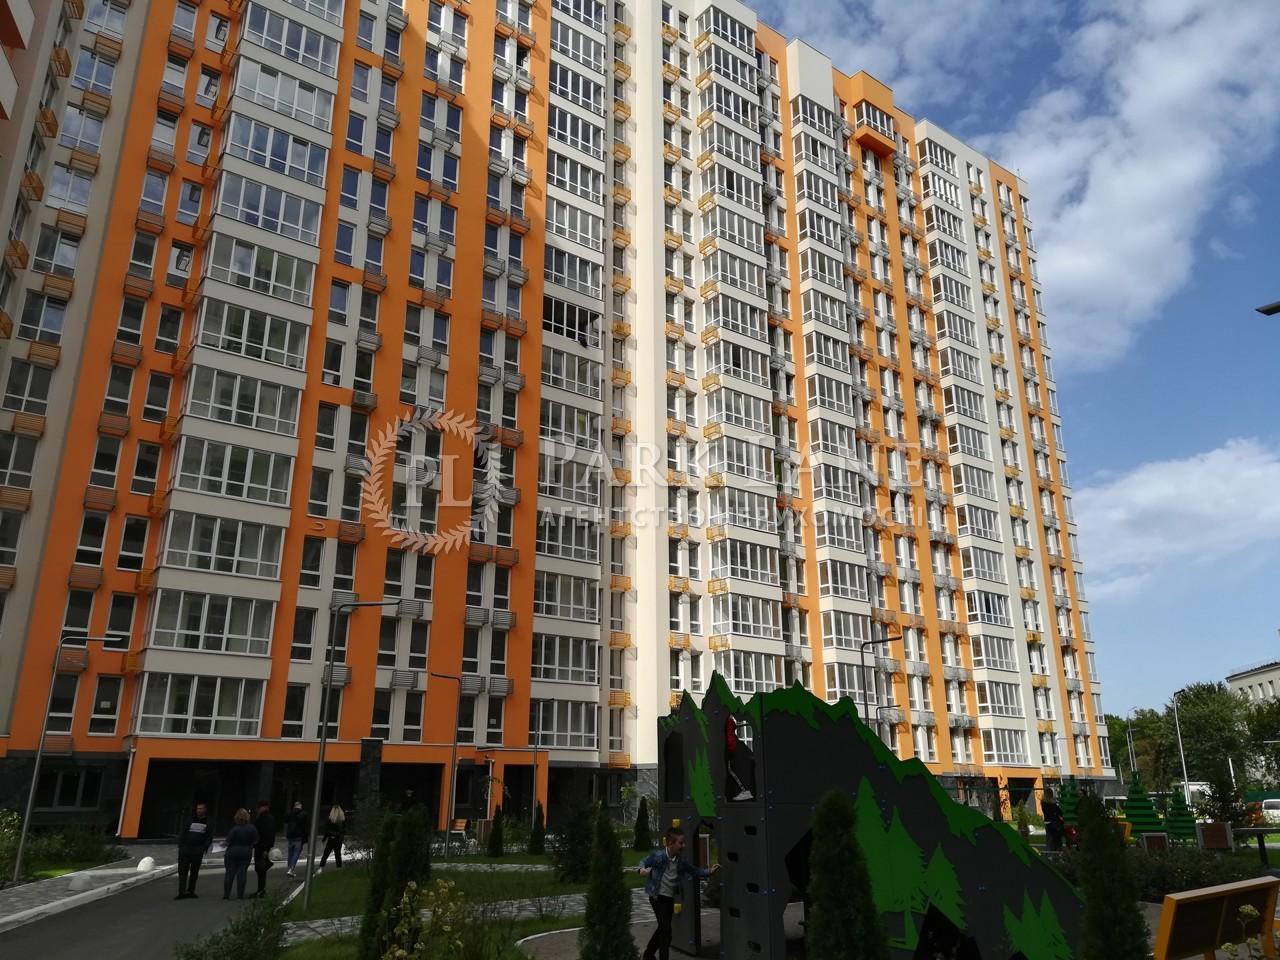 Квартира R-38743, Победы просп., 67 корпус 5, Киев - Фото 2